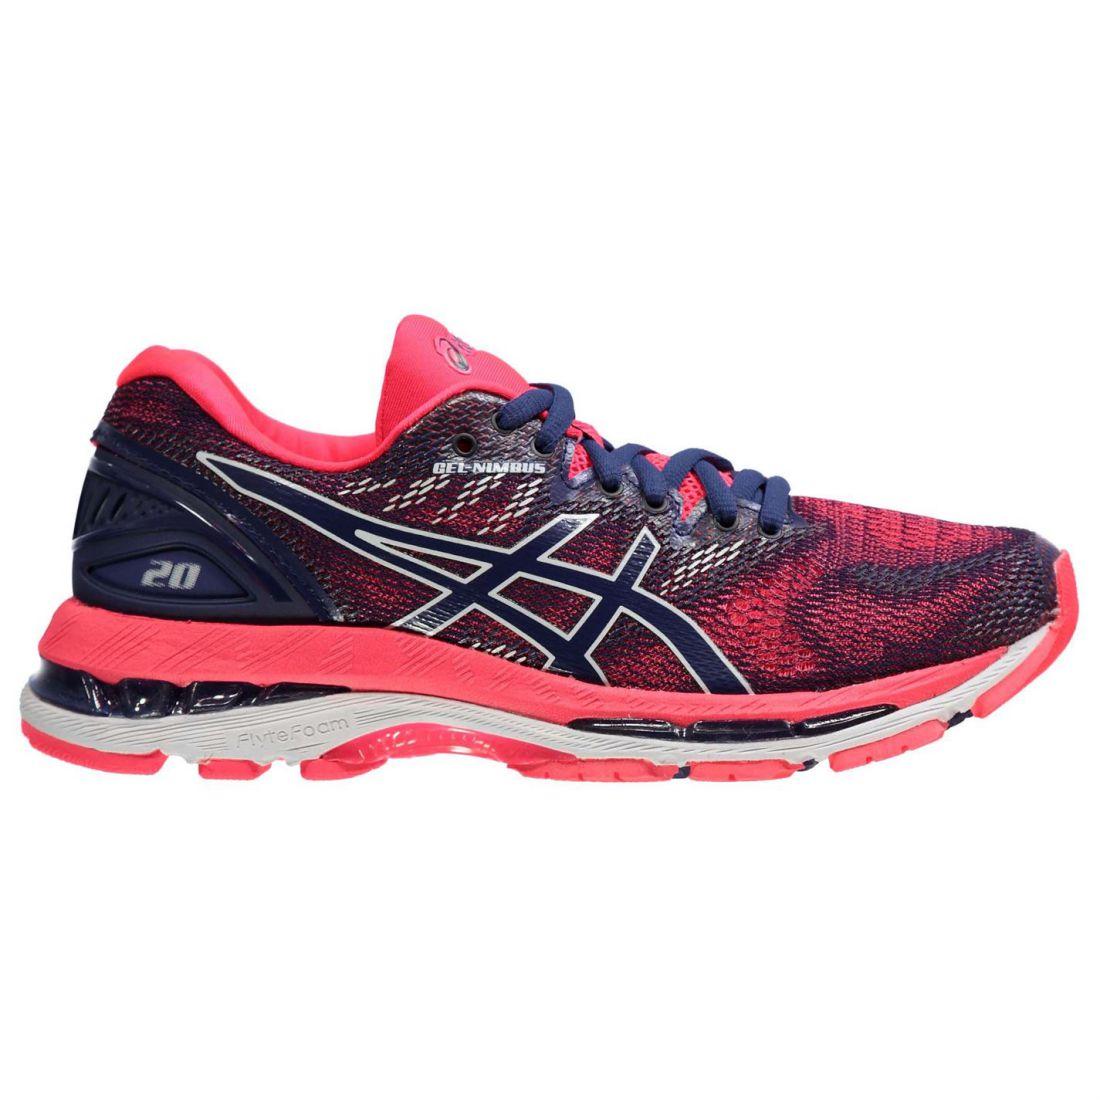 Asics Womens Gel Nimbus 20 Running Shoes Road Lightweight Ortholite ... bc6295b37d